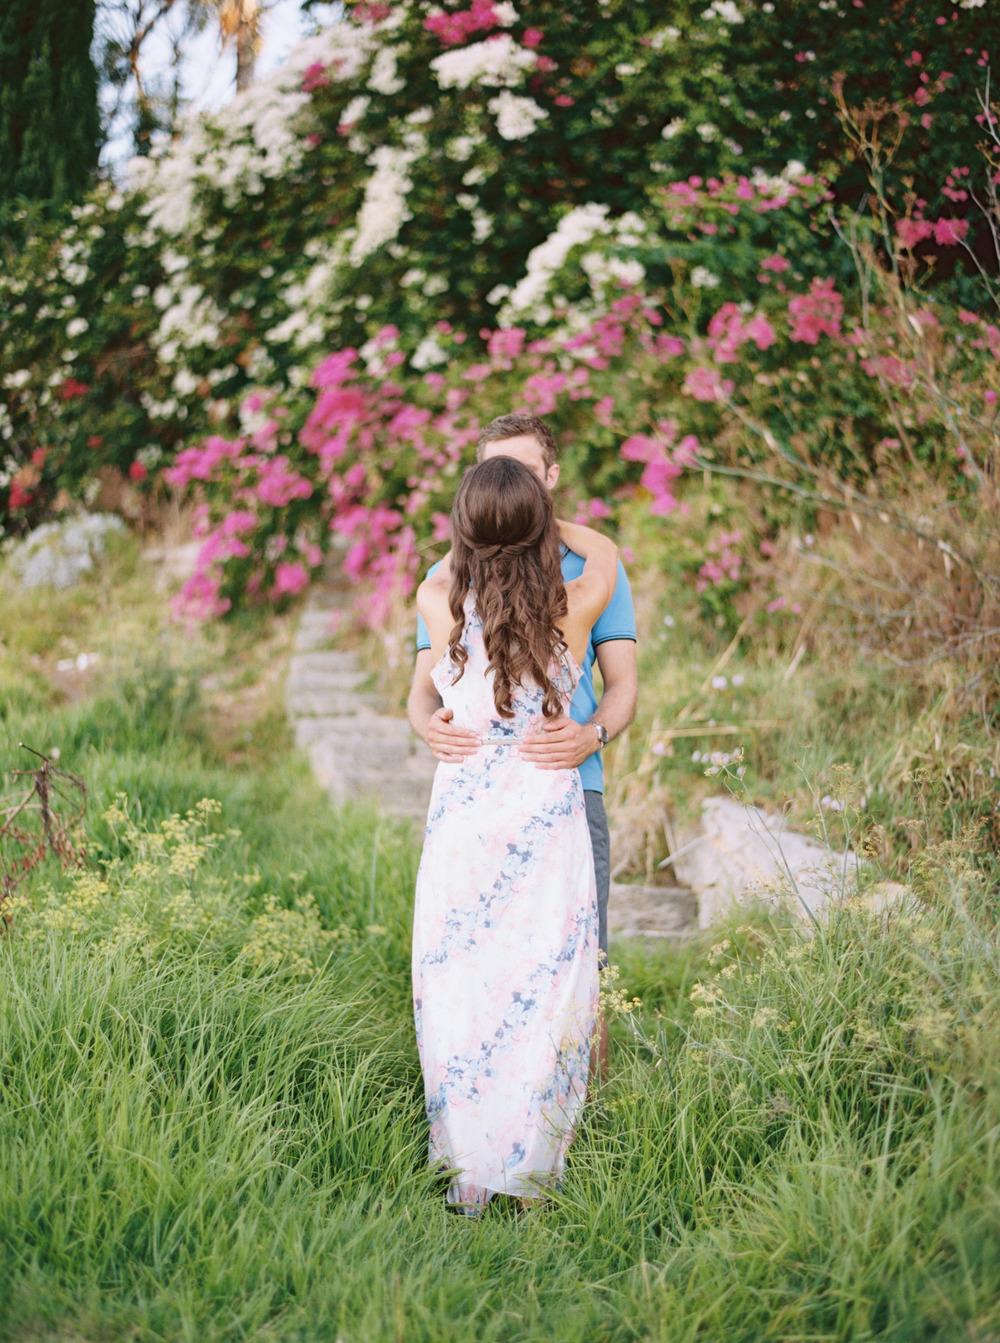 Meegan Cameron Katie Grant Photography-54.jpg